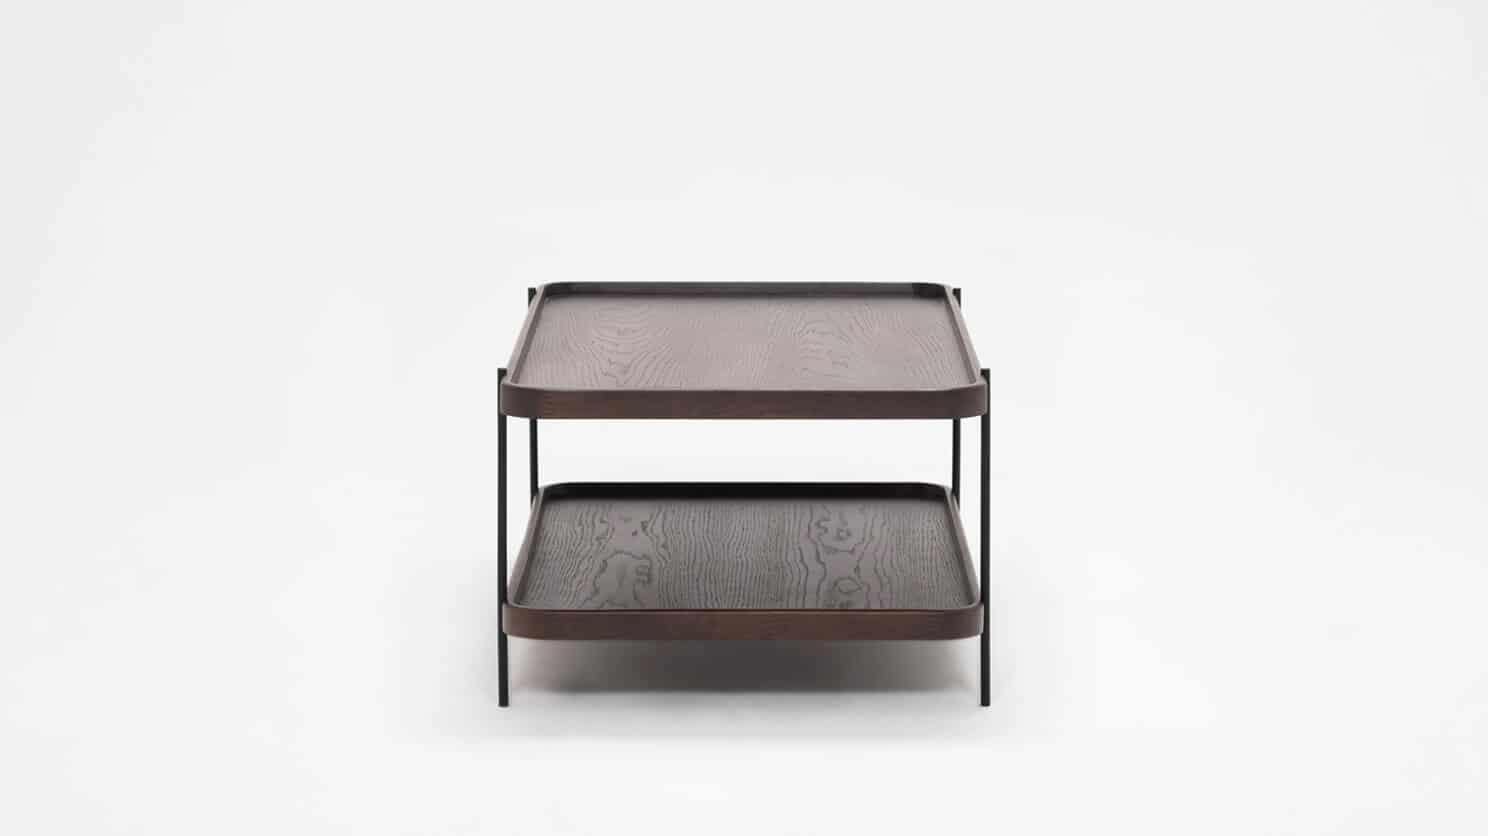 3020 419 17 4 coffee tables sage rectangular coffee table smoked oak side 01